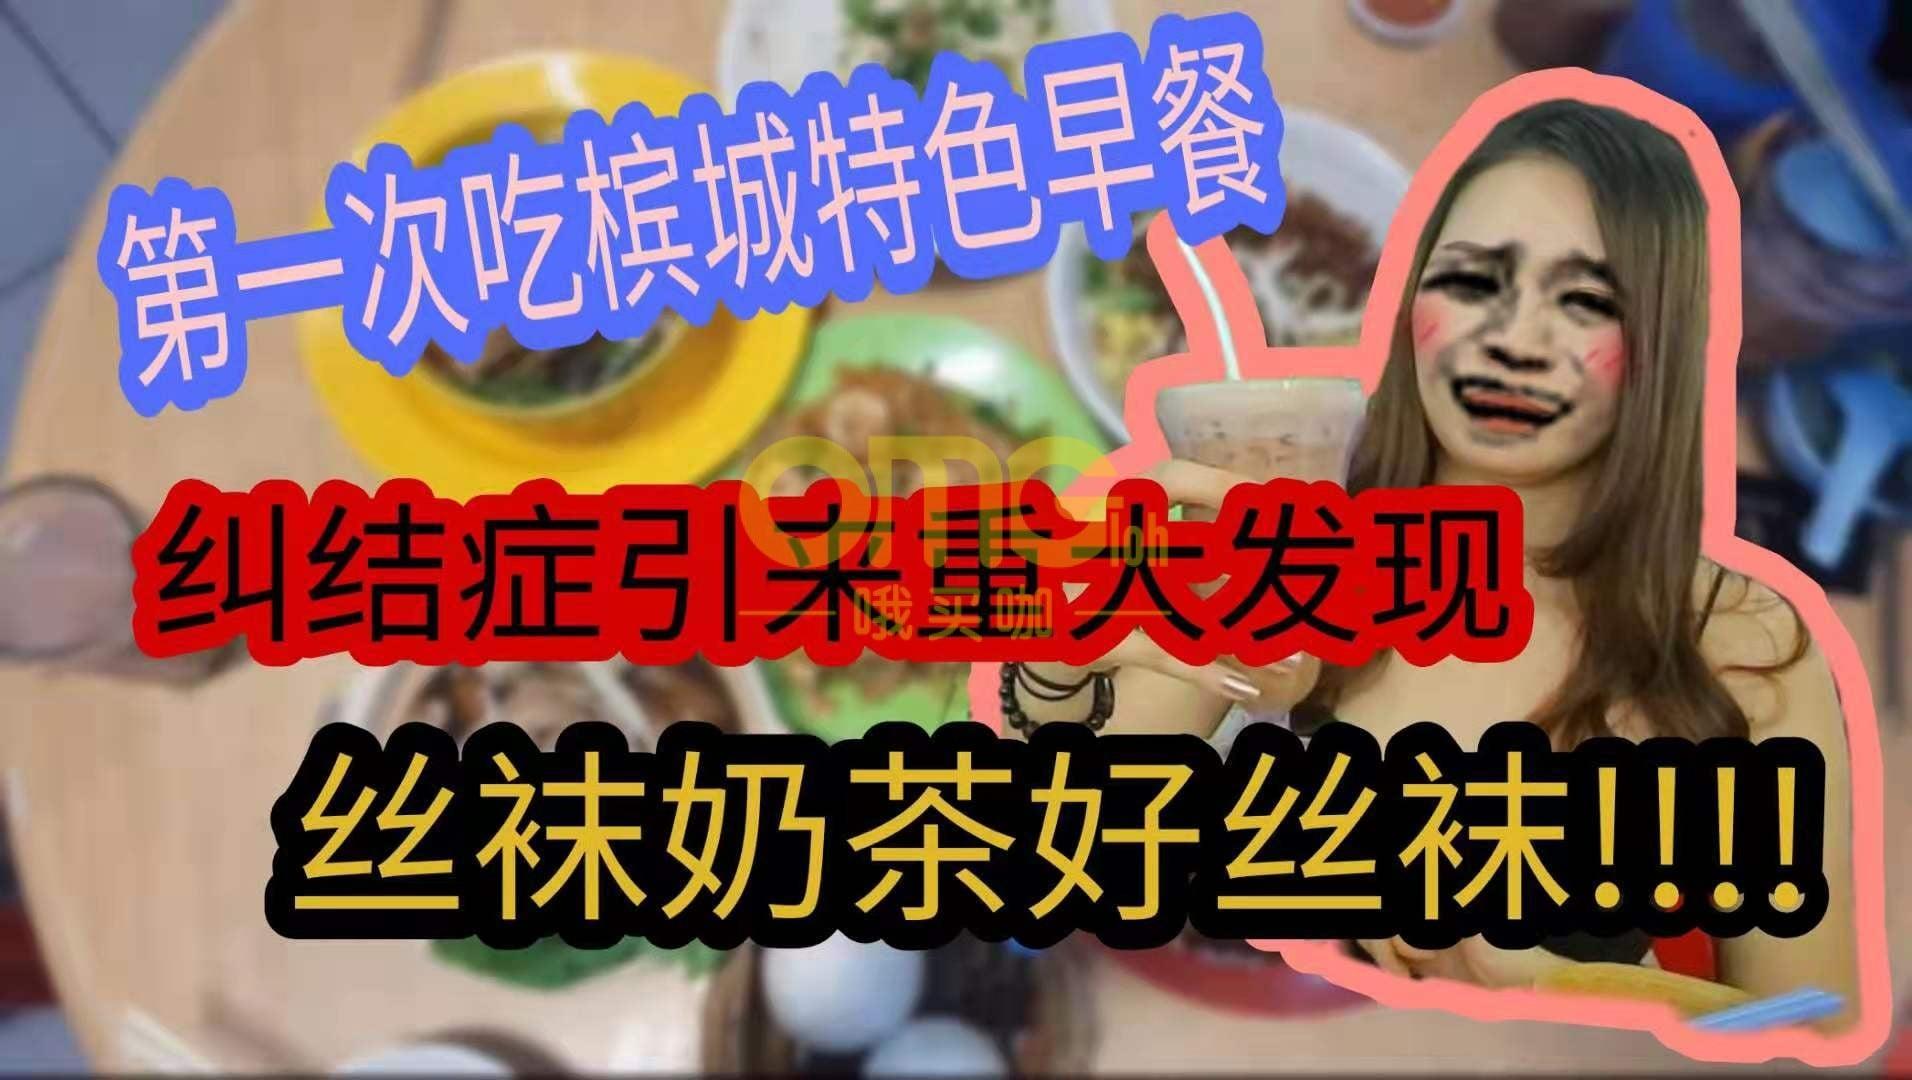 WeChat Image 20190718232013 at omgloh.com